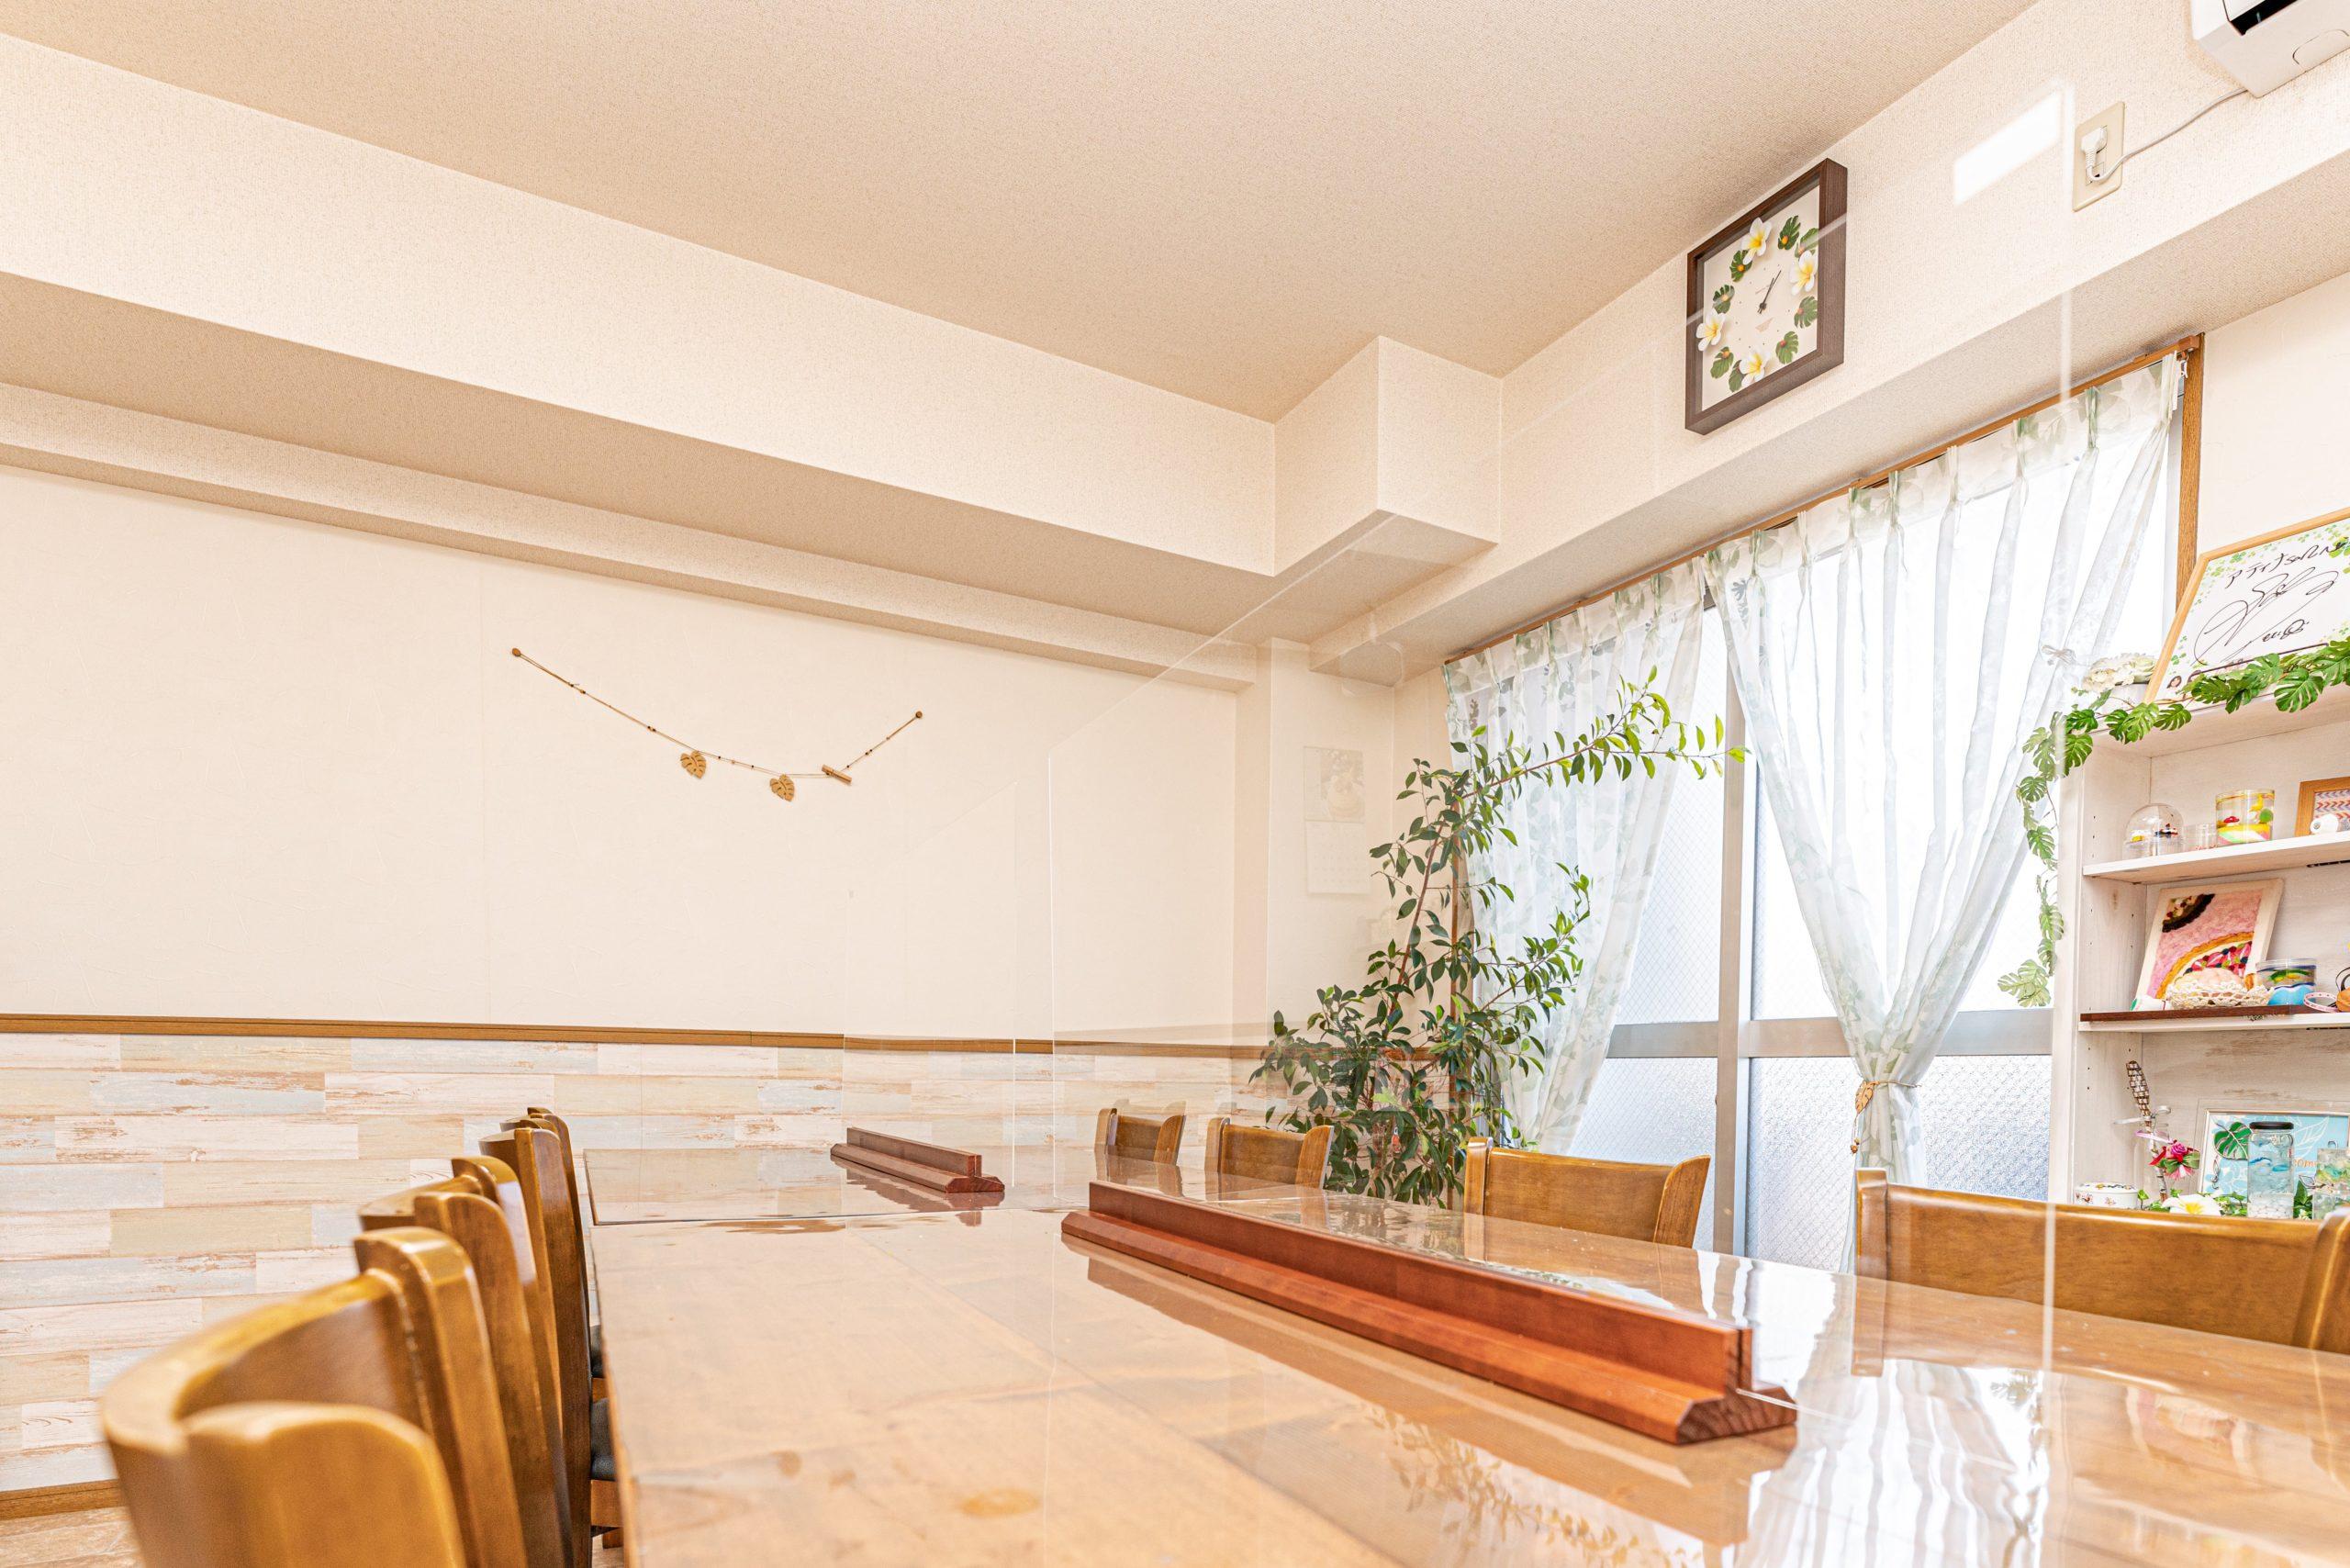 2020.10.24 athina culture school (137)-min